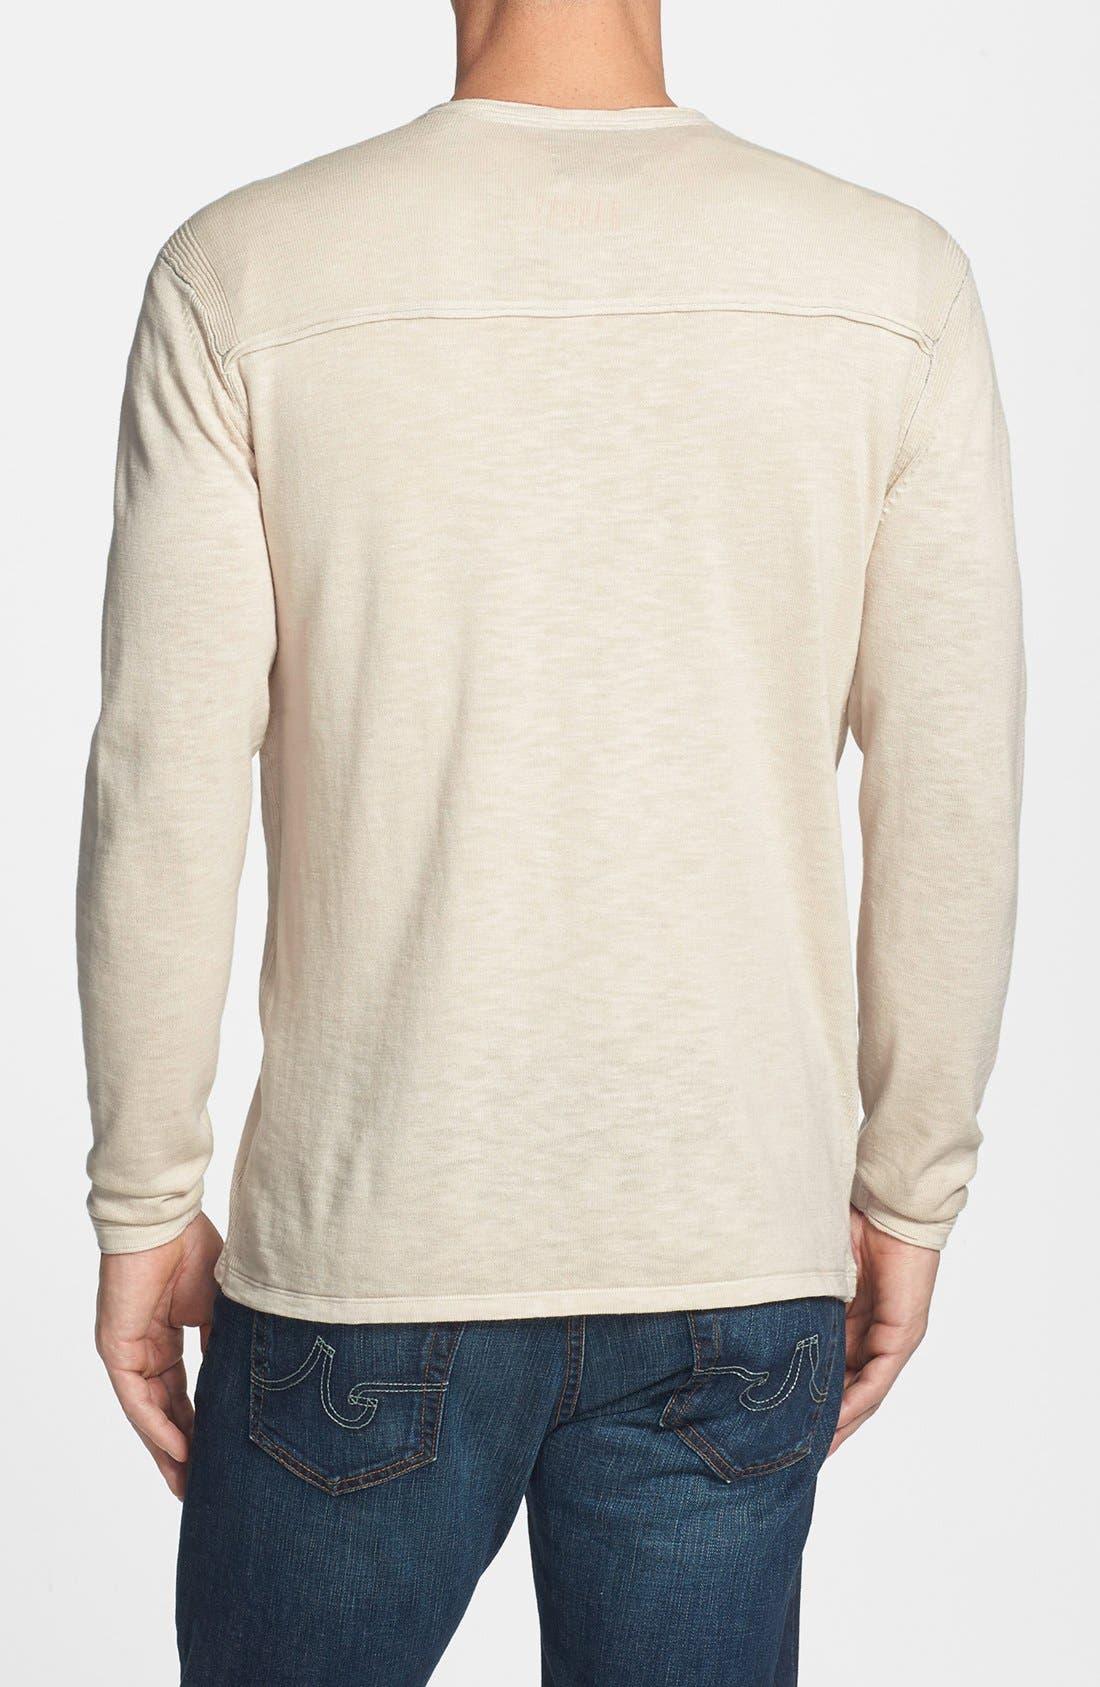 Alternate Image 2  - Tommy Bahama Denim 'Sandstone Beach' Cotton V-Neck Sweatshirt